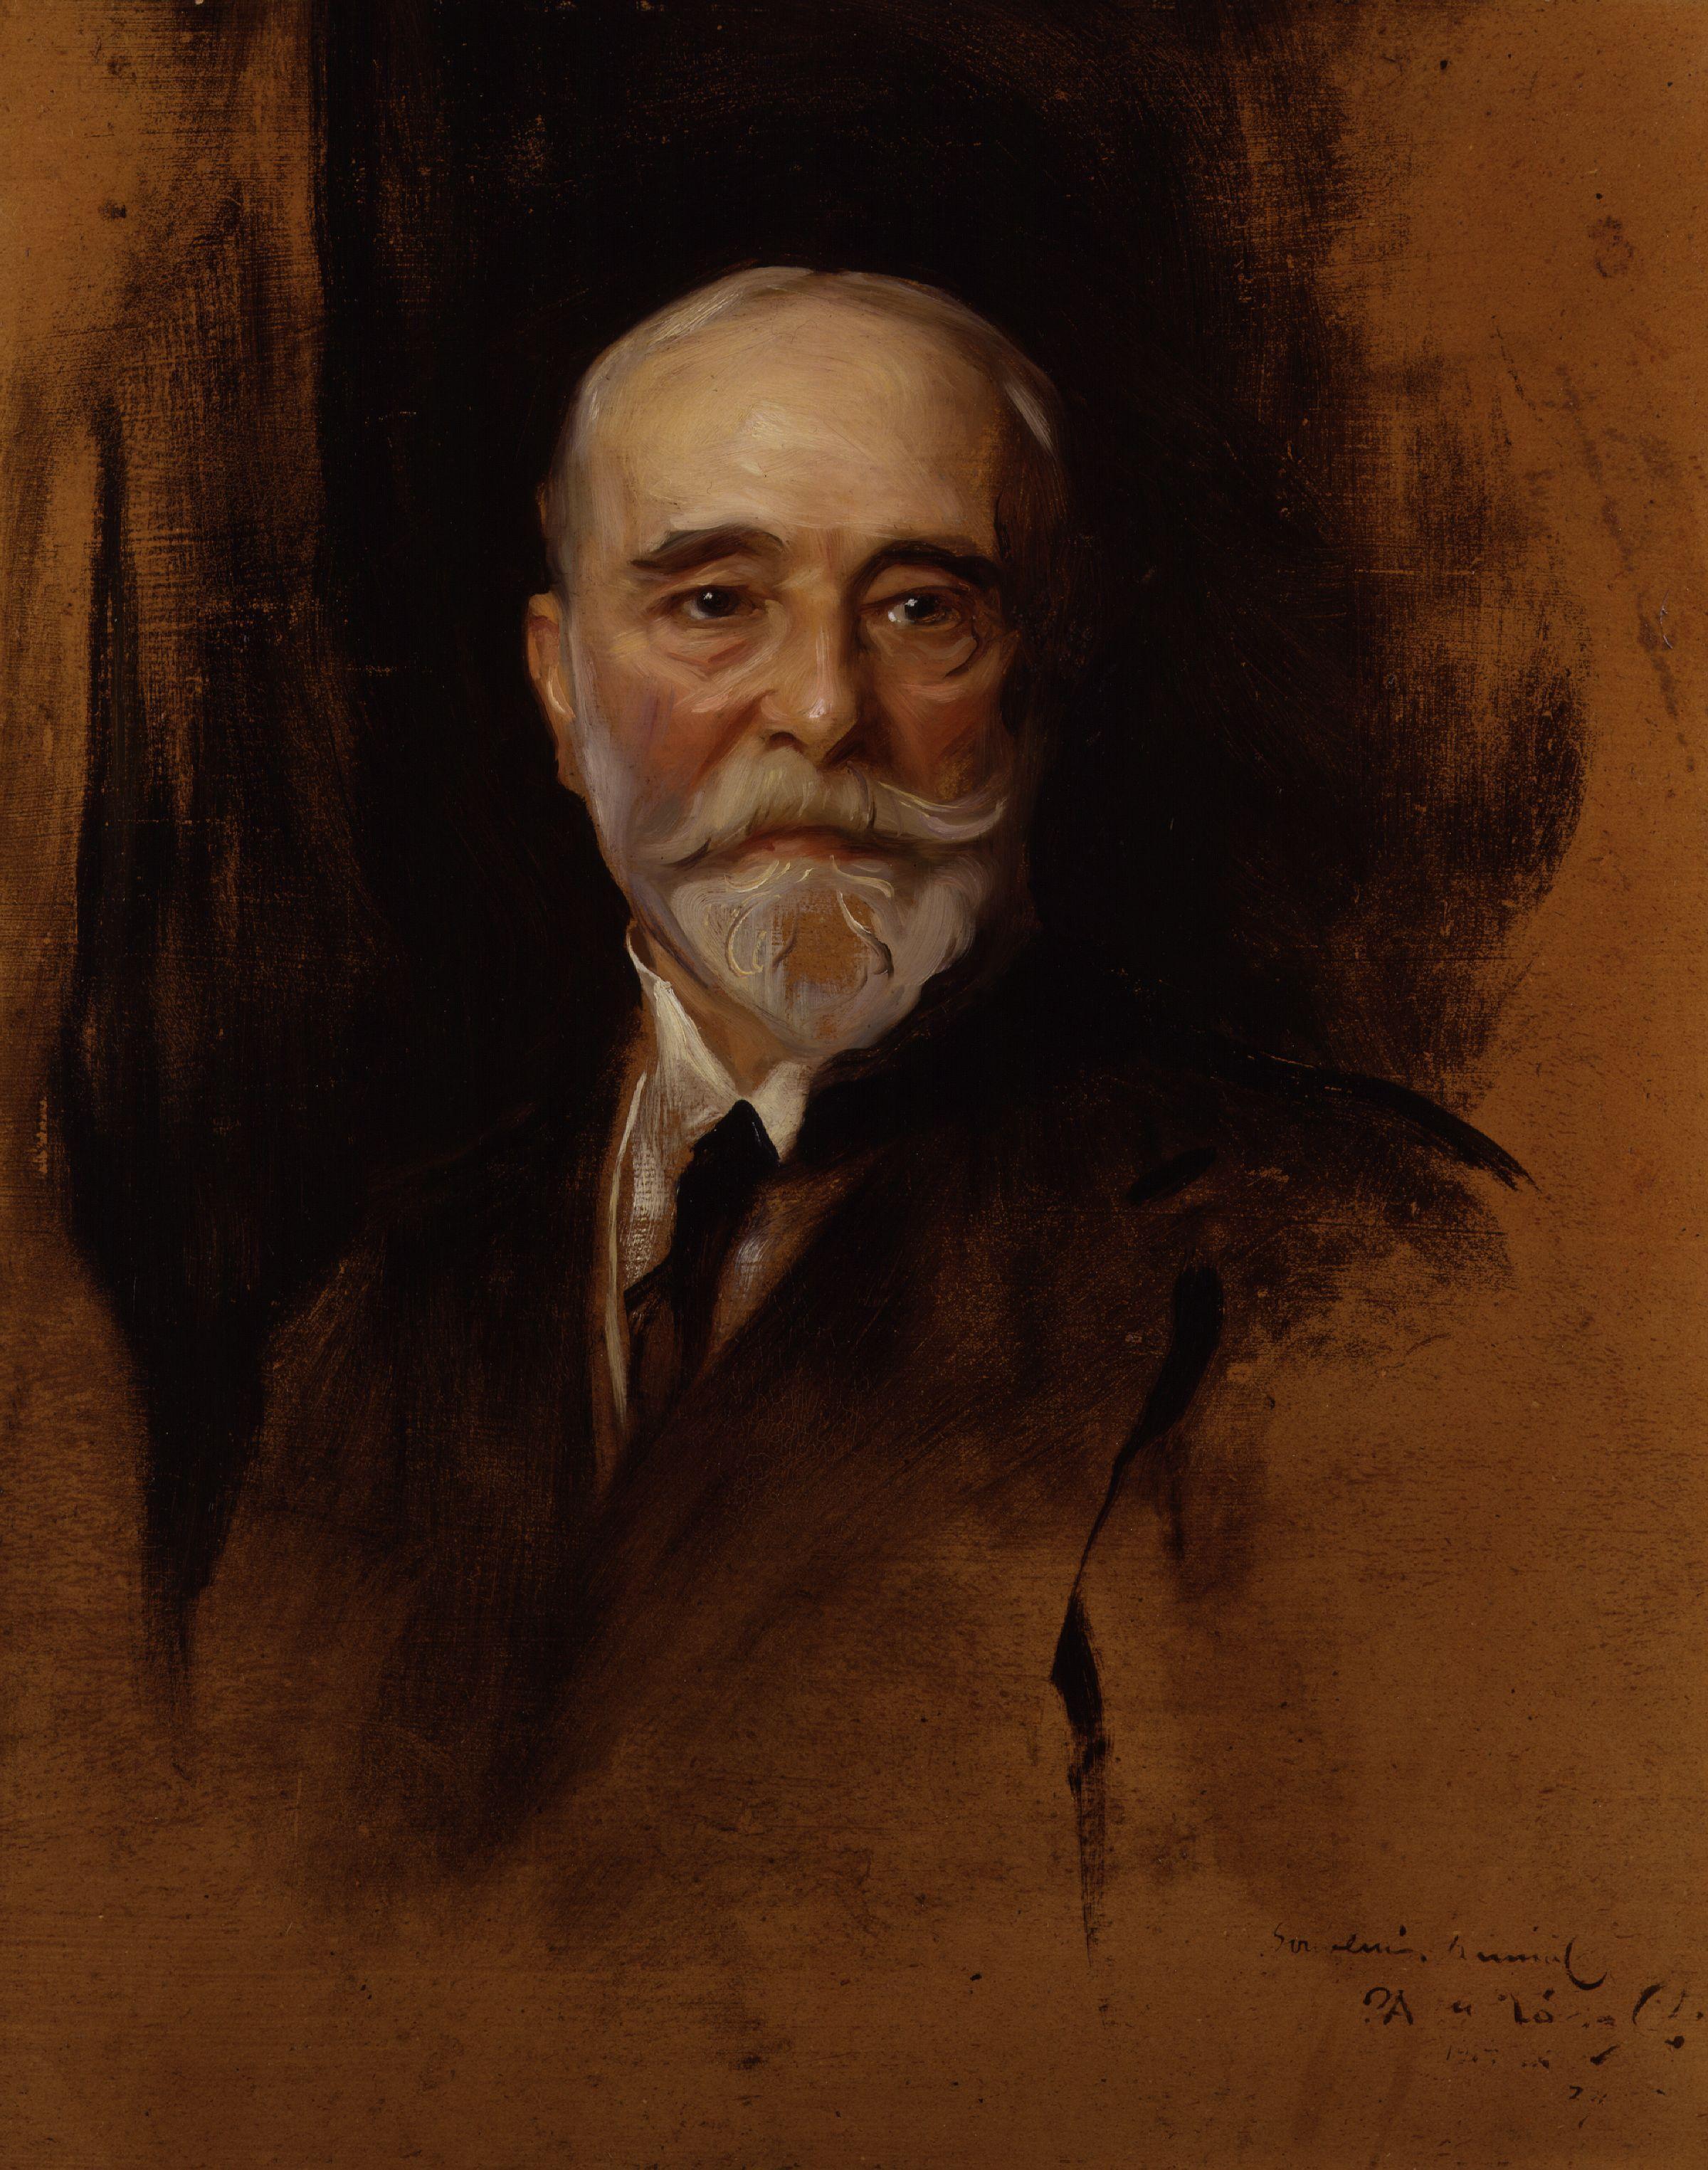 https://upload.wikimedia.org/wikipedia/commons/7/7e/Sir_%28Samuel%29_Luke_Fildes_by_Philip_Alexius_de_L%C3%A1szl%C3%B3.jpg